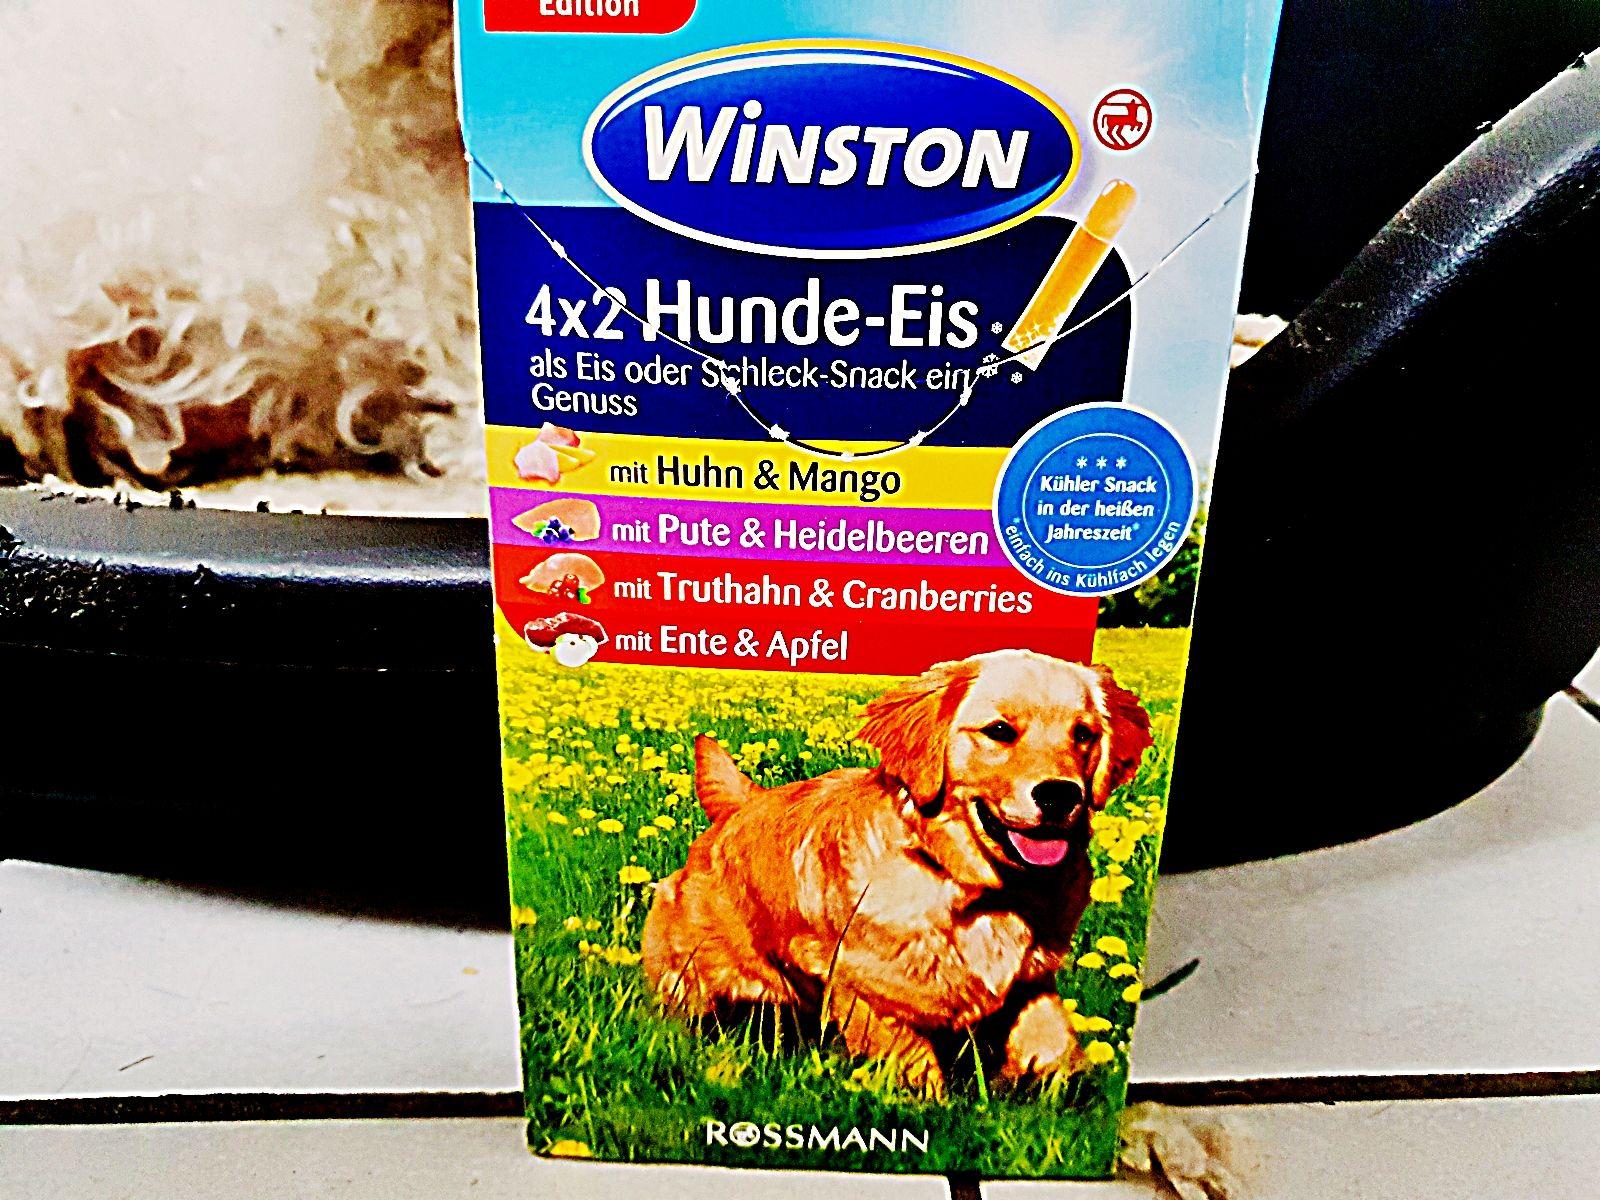 Winston 4x2 Hunde-Eis Review